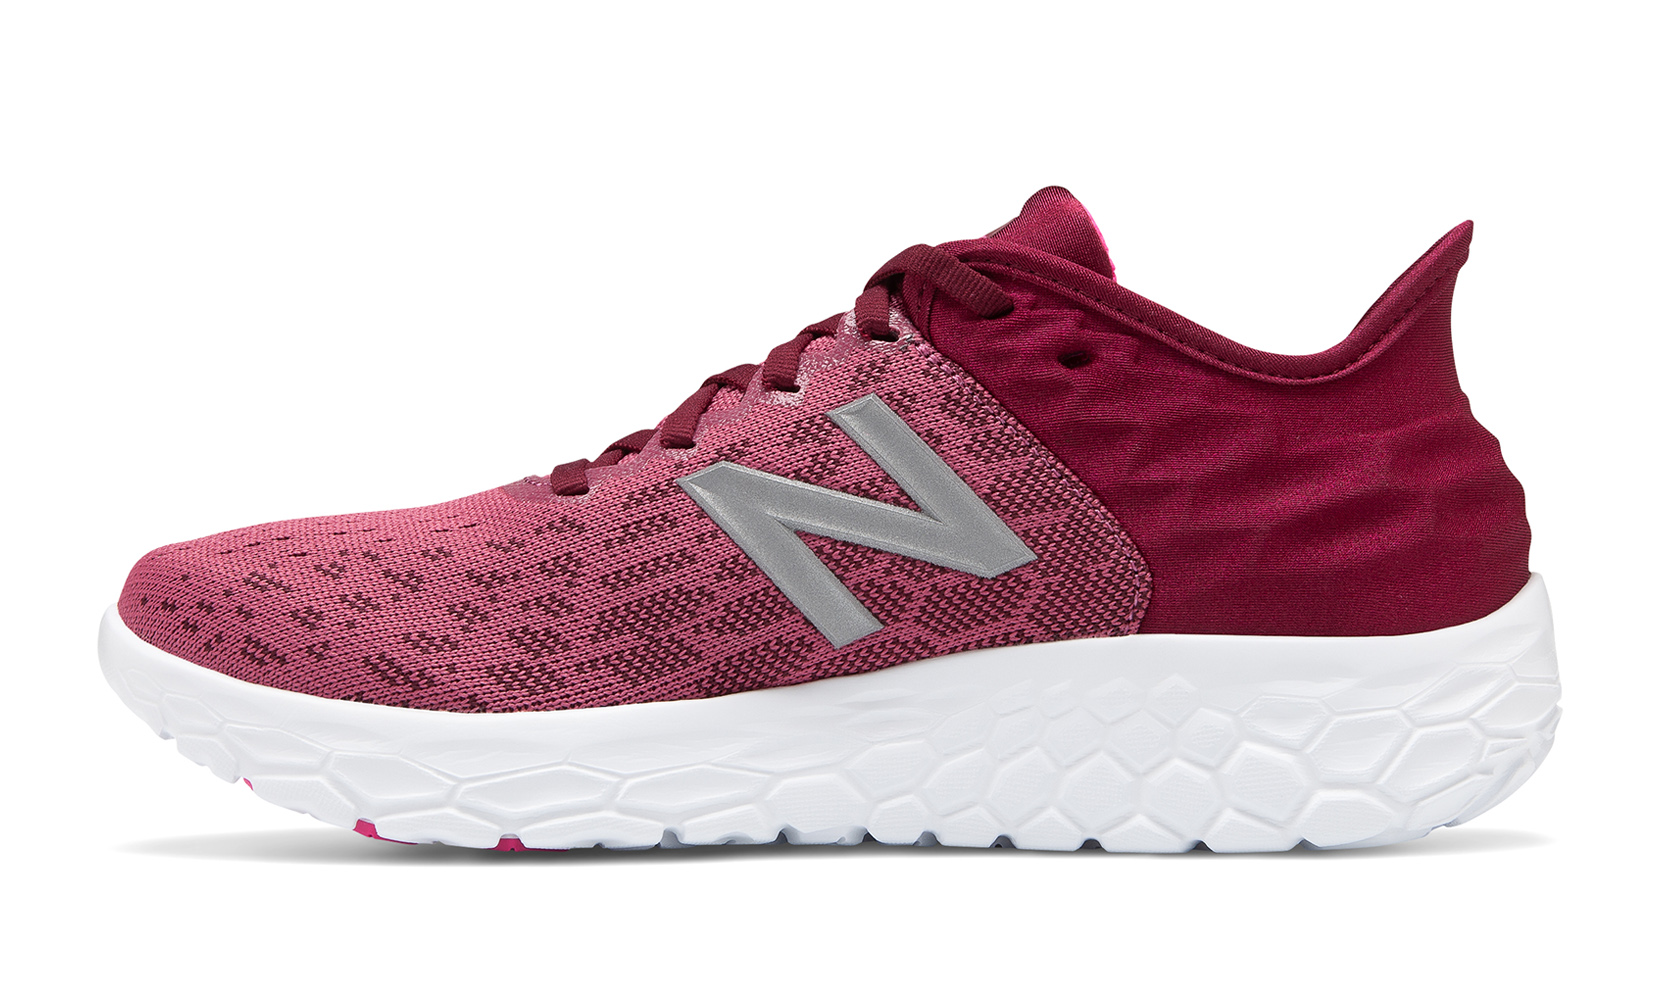 Жіноче взуття для бігу Fresh Foam Beacon v2 WBECNDF2 | New Balance